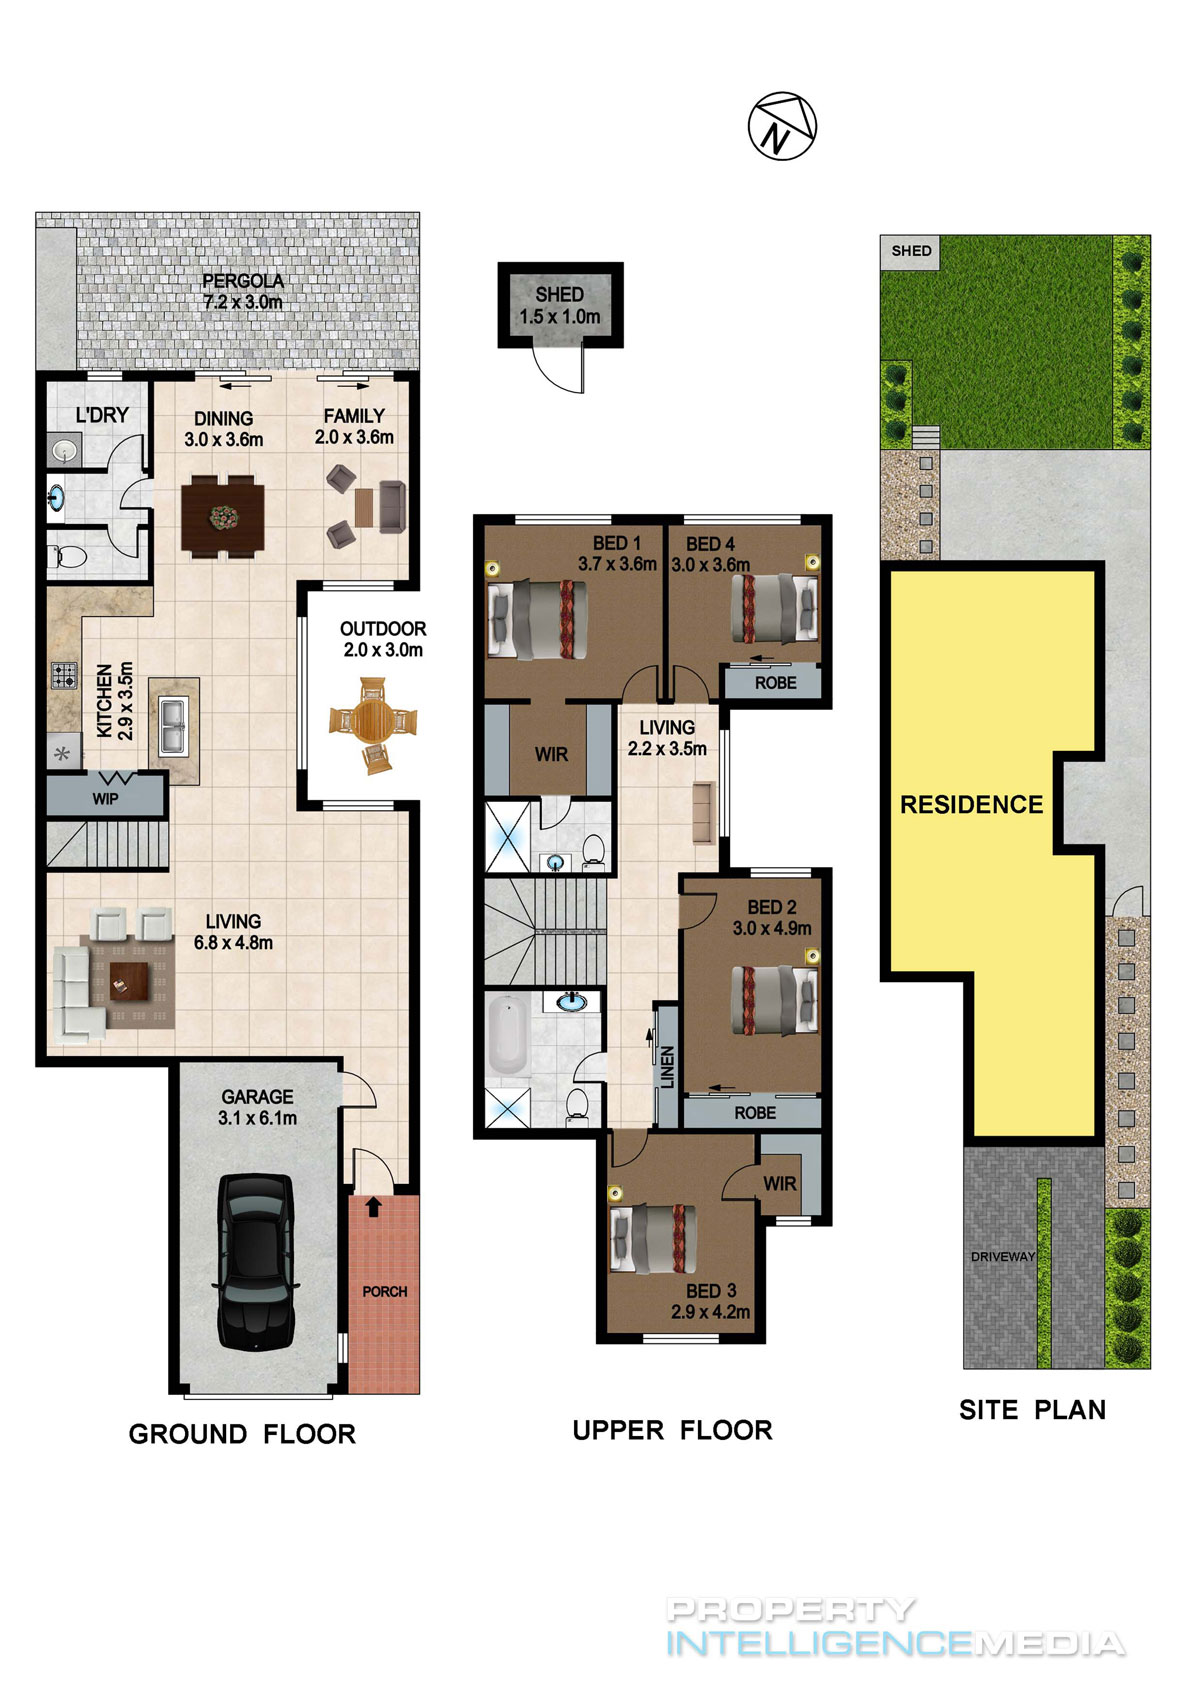 2d 3d floor plans property intelligence media - 3d floor plan free ...